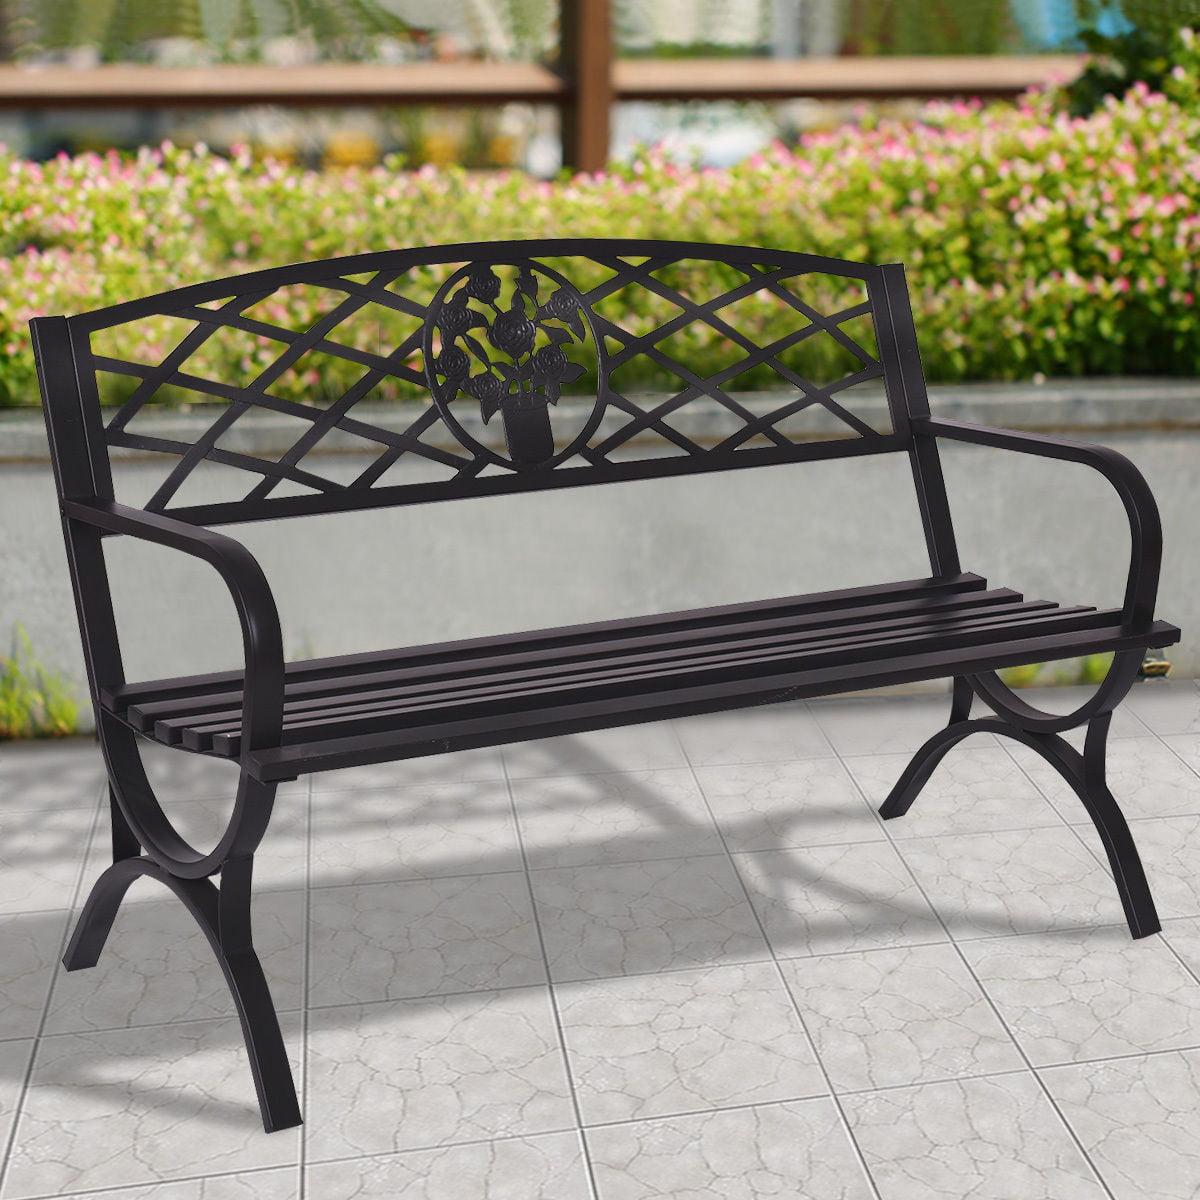 Costway 50'' Patio Garden Bench Park Yard Outdoor Furniture Steel Frame Porch Chair Seat by Costway